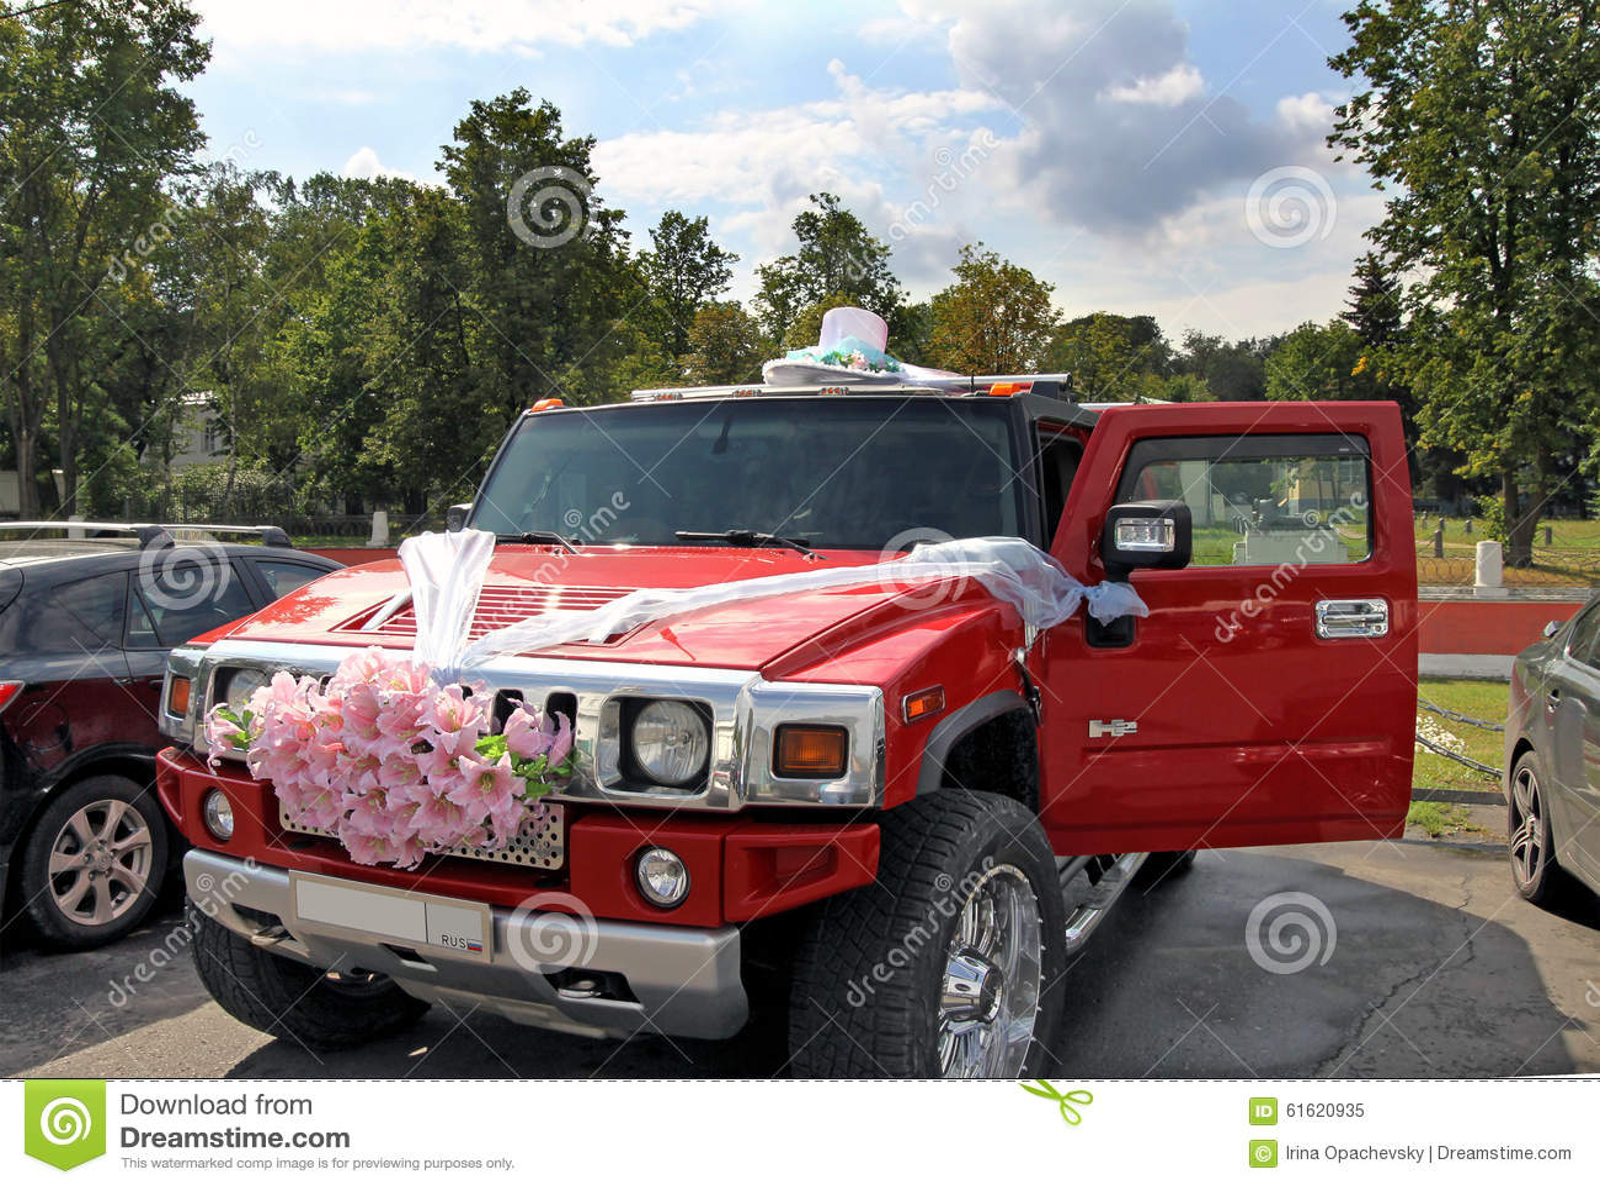 Design of bridal car - Wedding Car Design Editorial Image